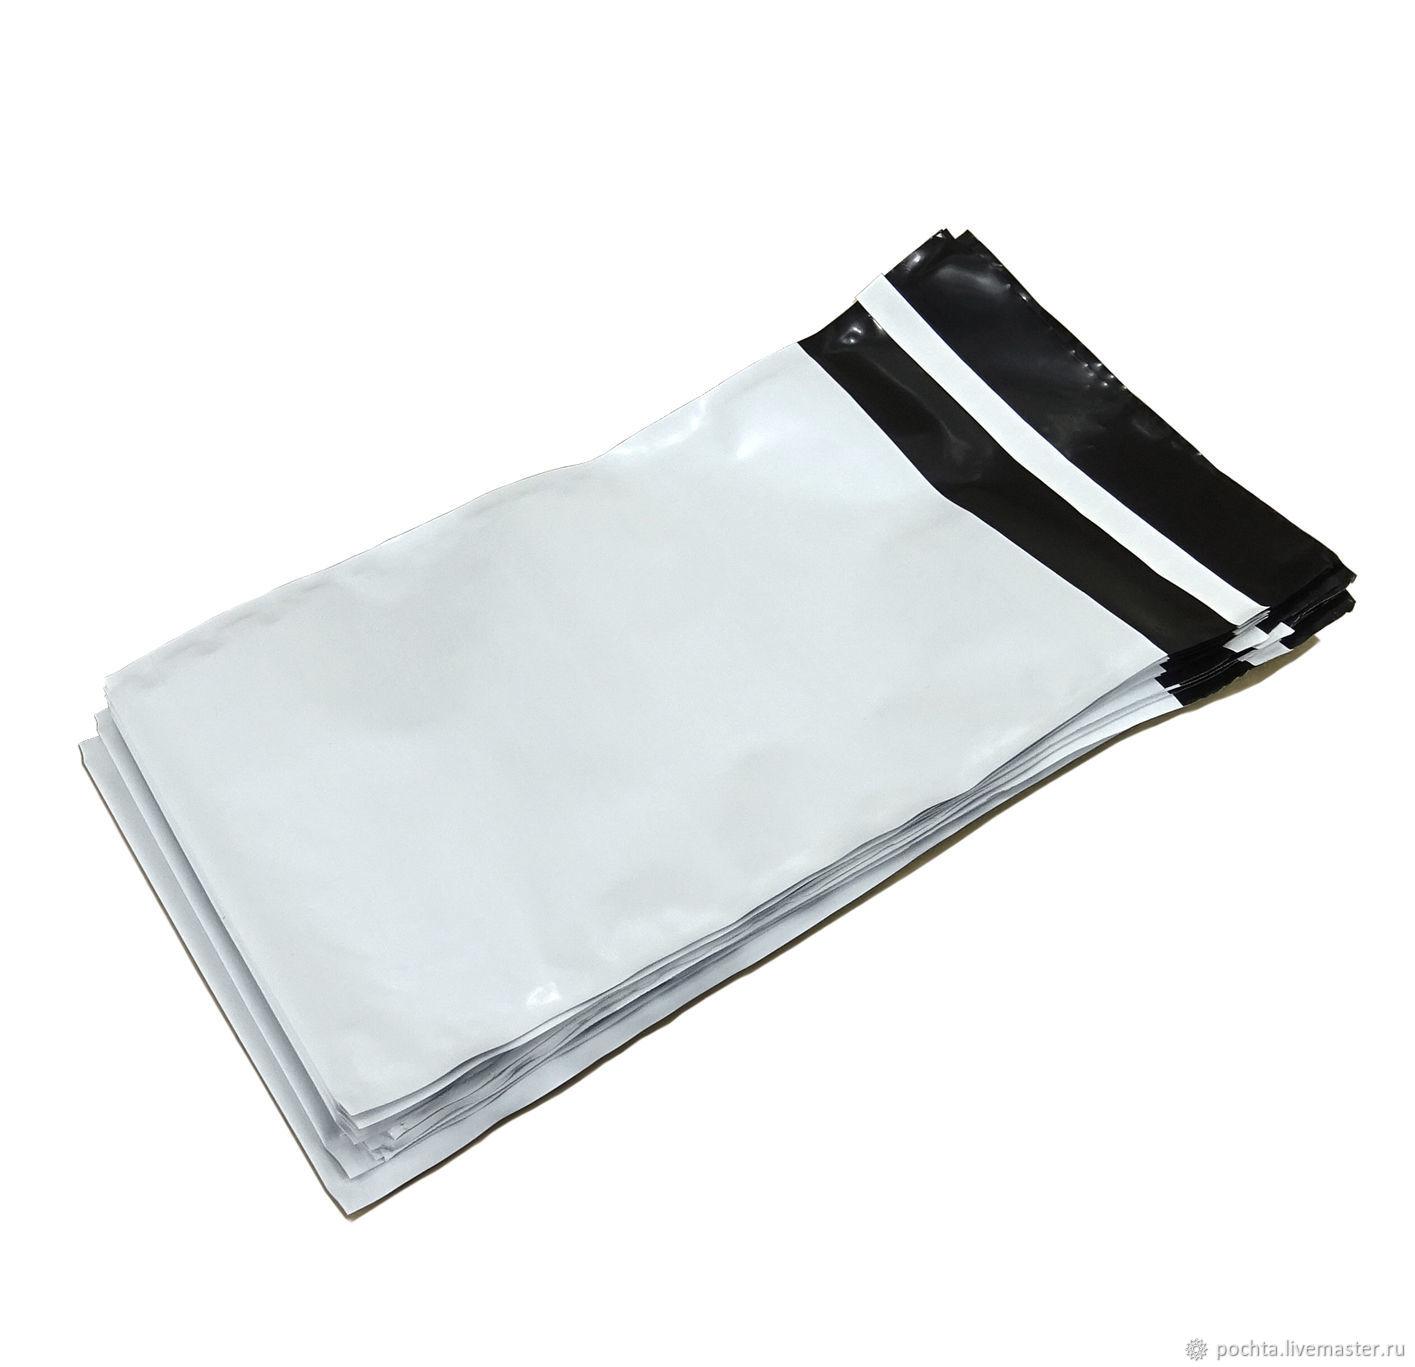 Белые курьер пакеты без кармана 150х210 . Плотность 50 мкм, Пакеты, Москва,  Фото №1